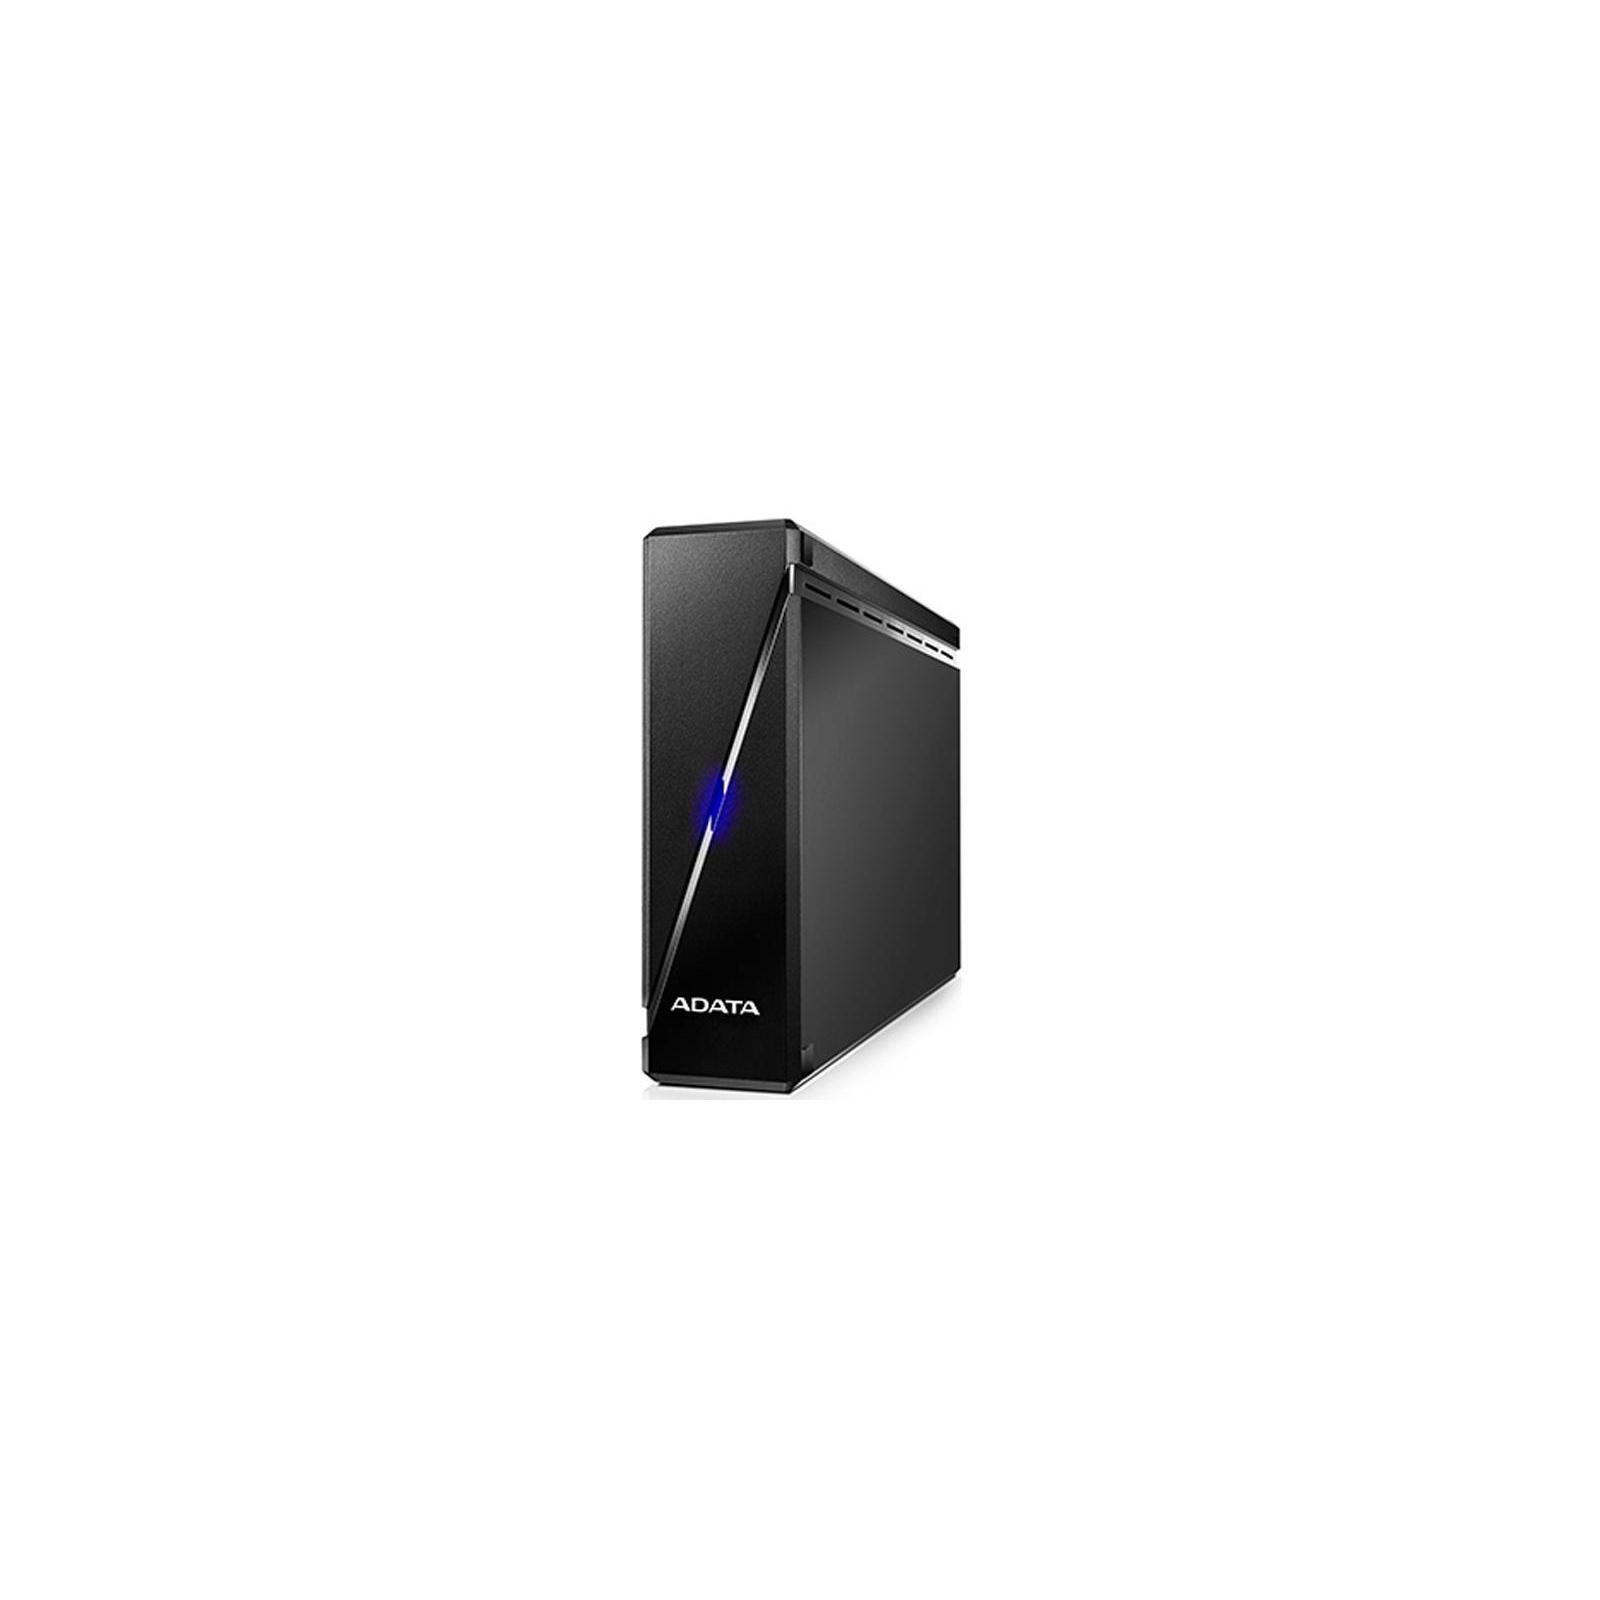 "Внешний жесткий диск 3.5"" 4TB ADATA (AHM900-4TU3-CUSBK)"